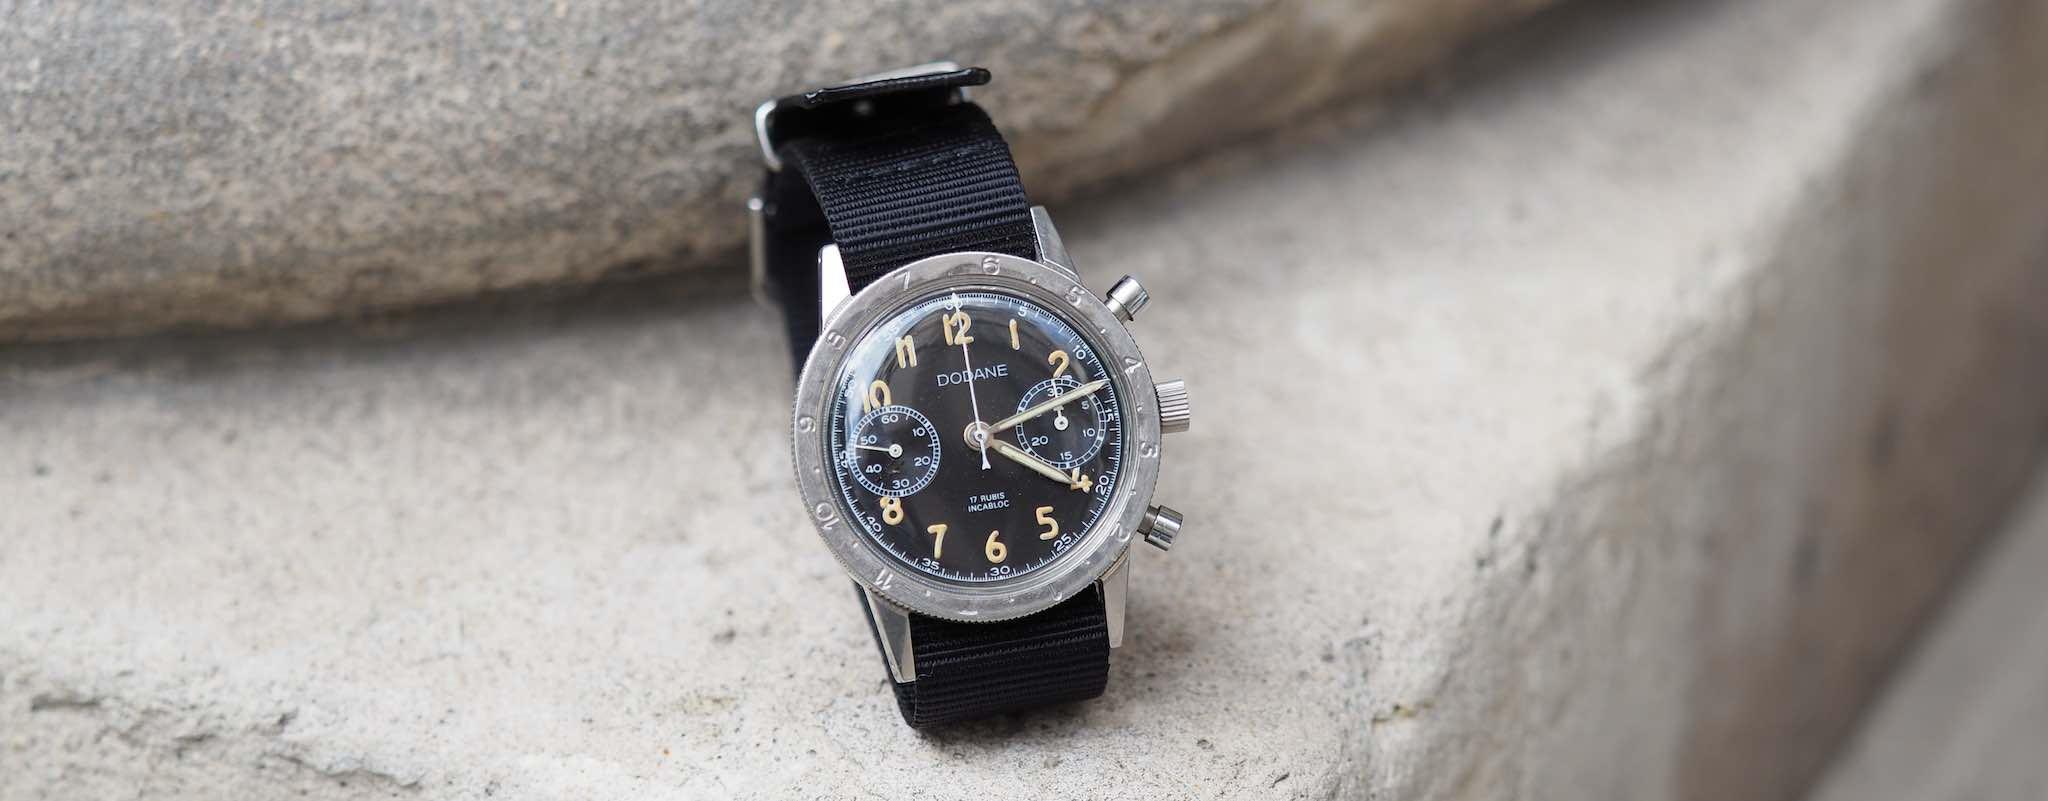 achat montre militaire dodane